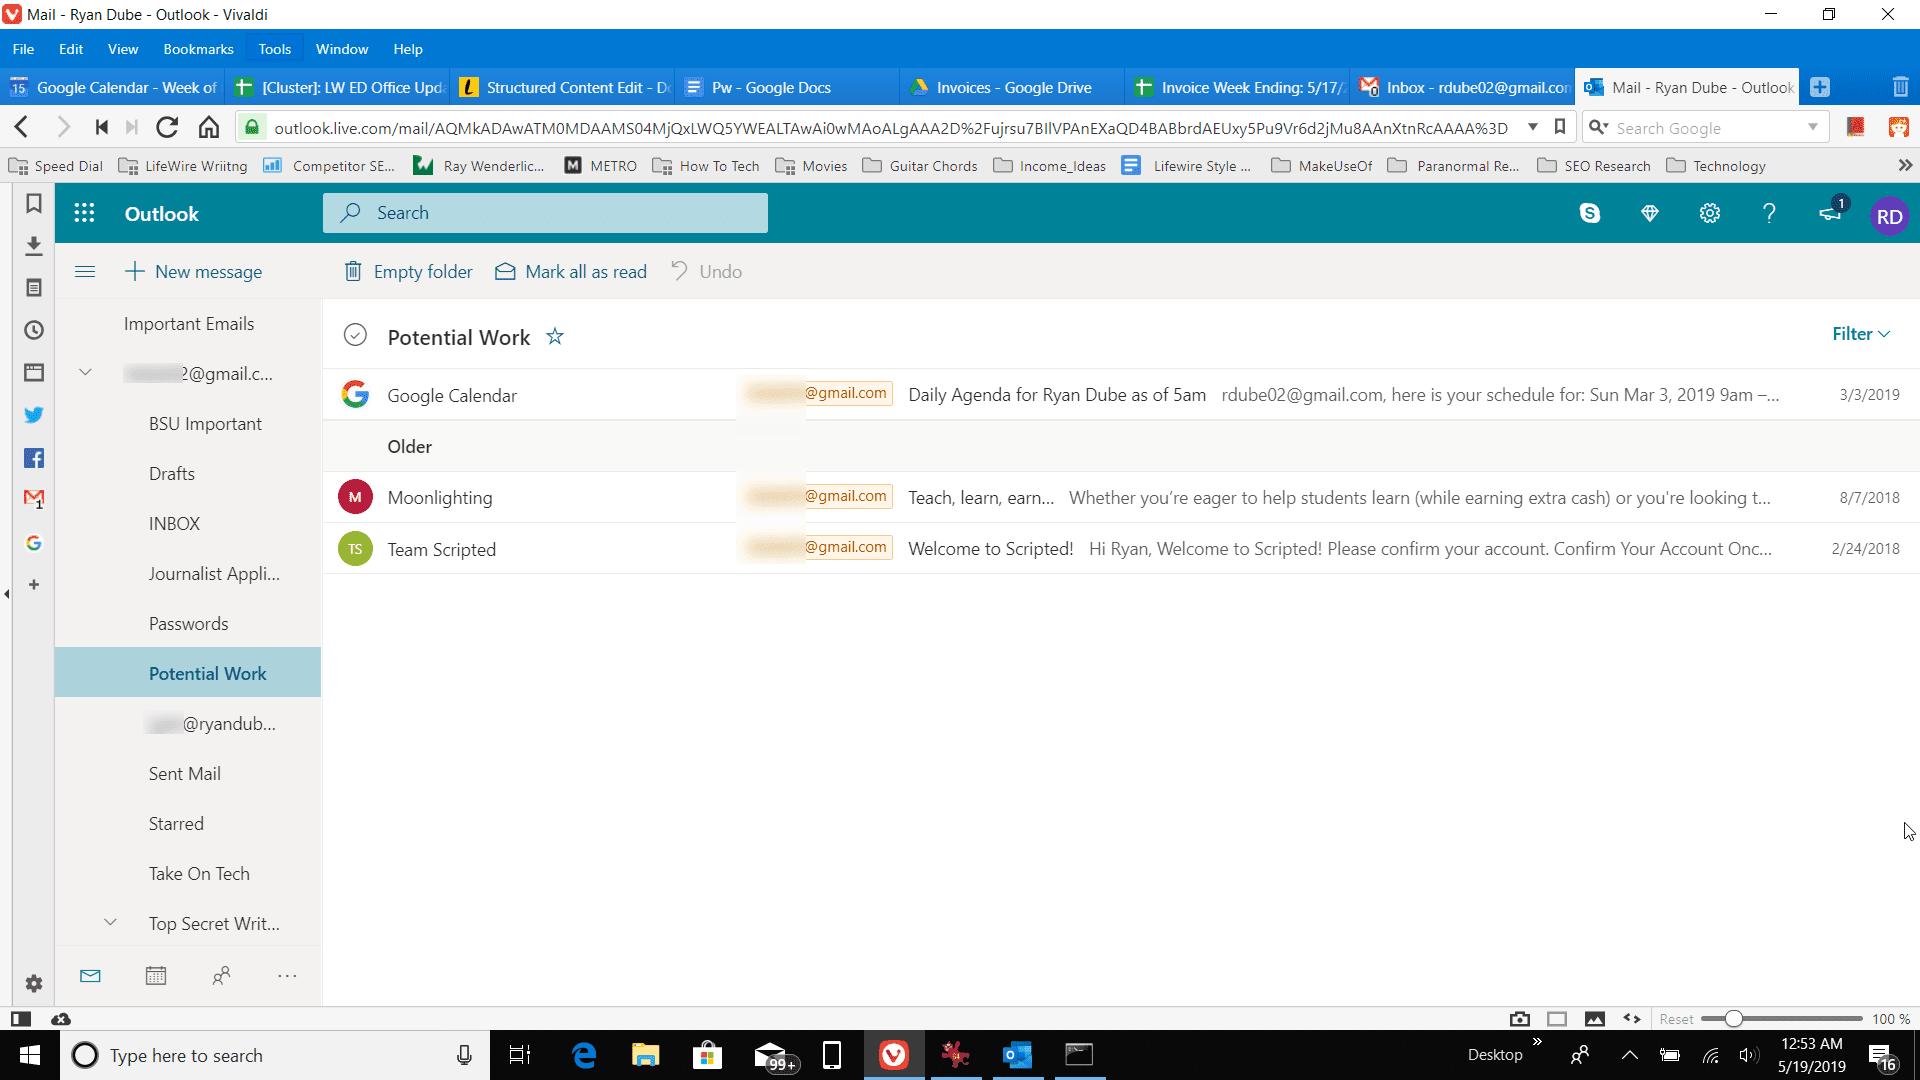 Screenshot of selecting a folder in Outlook online